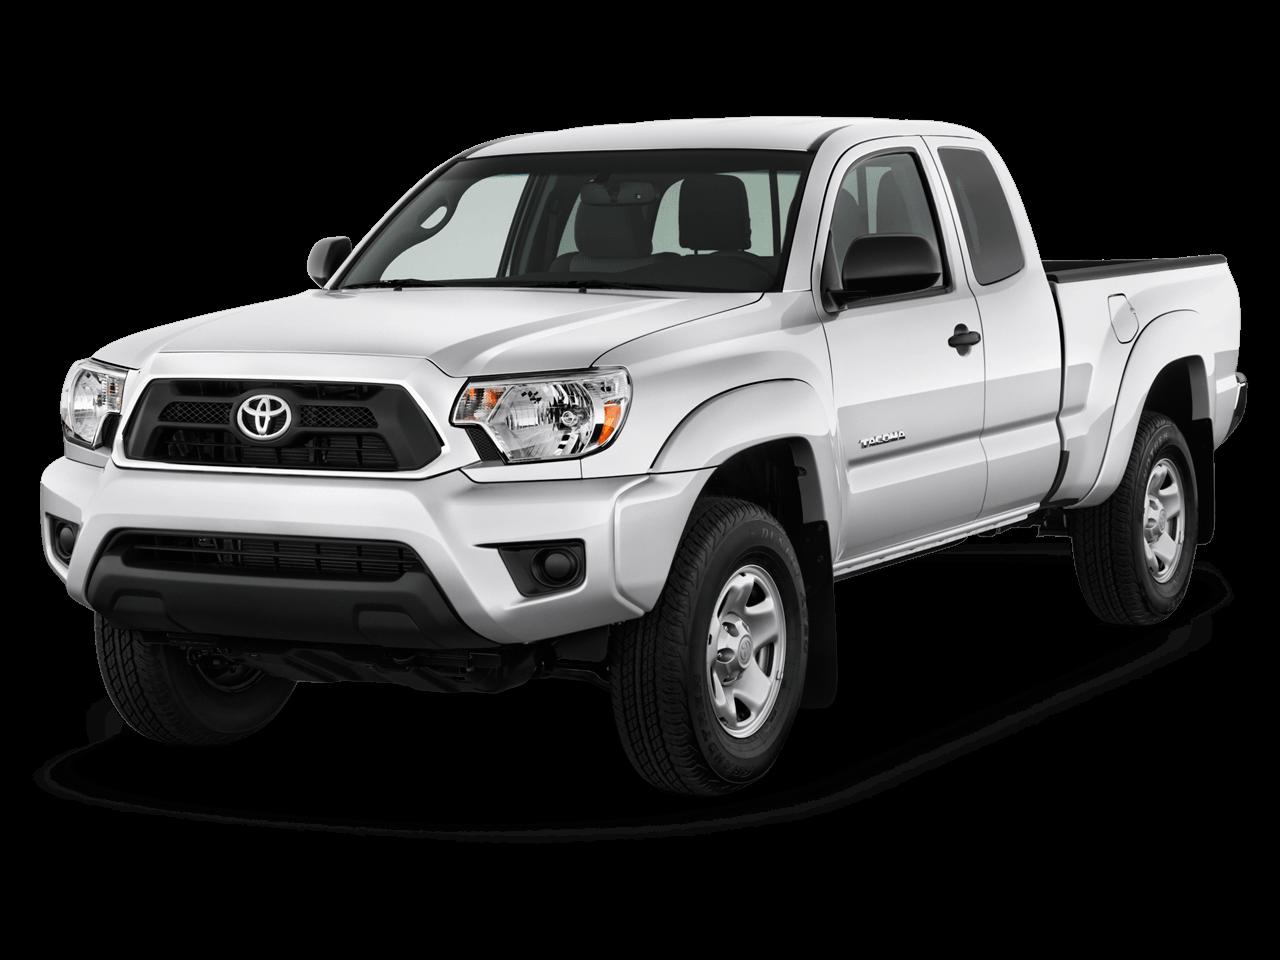 Download Toyota Png Image Car Image HQ PNG Image | FreePNGImg